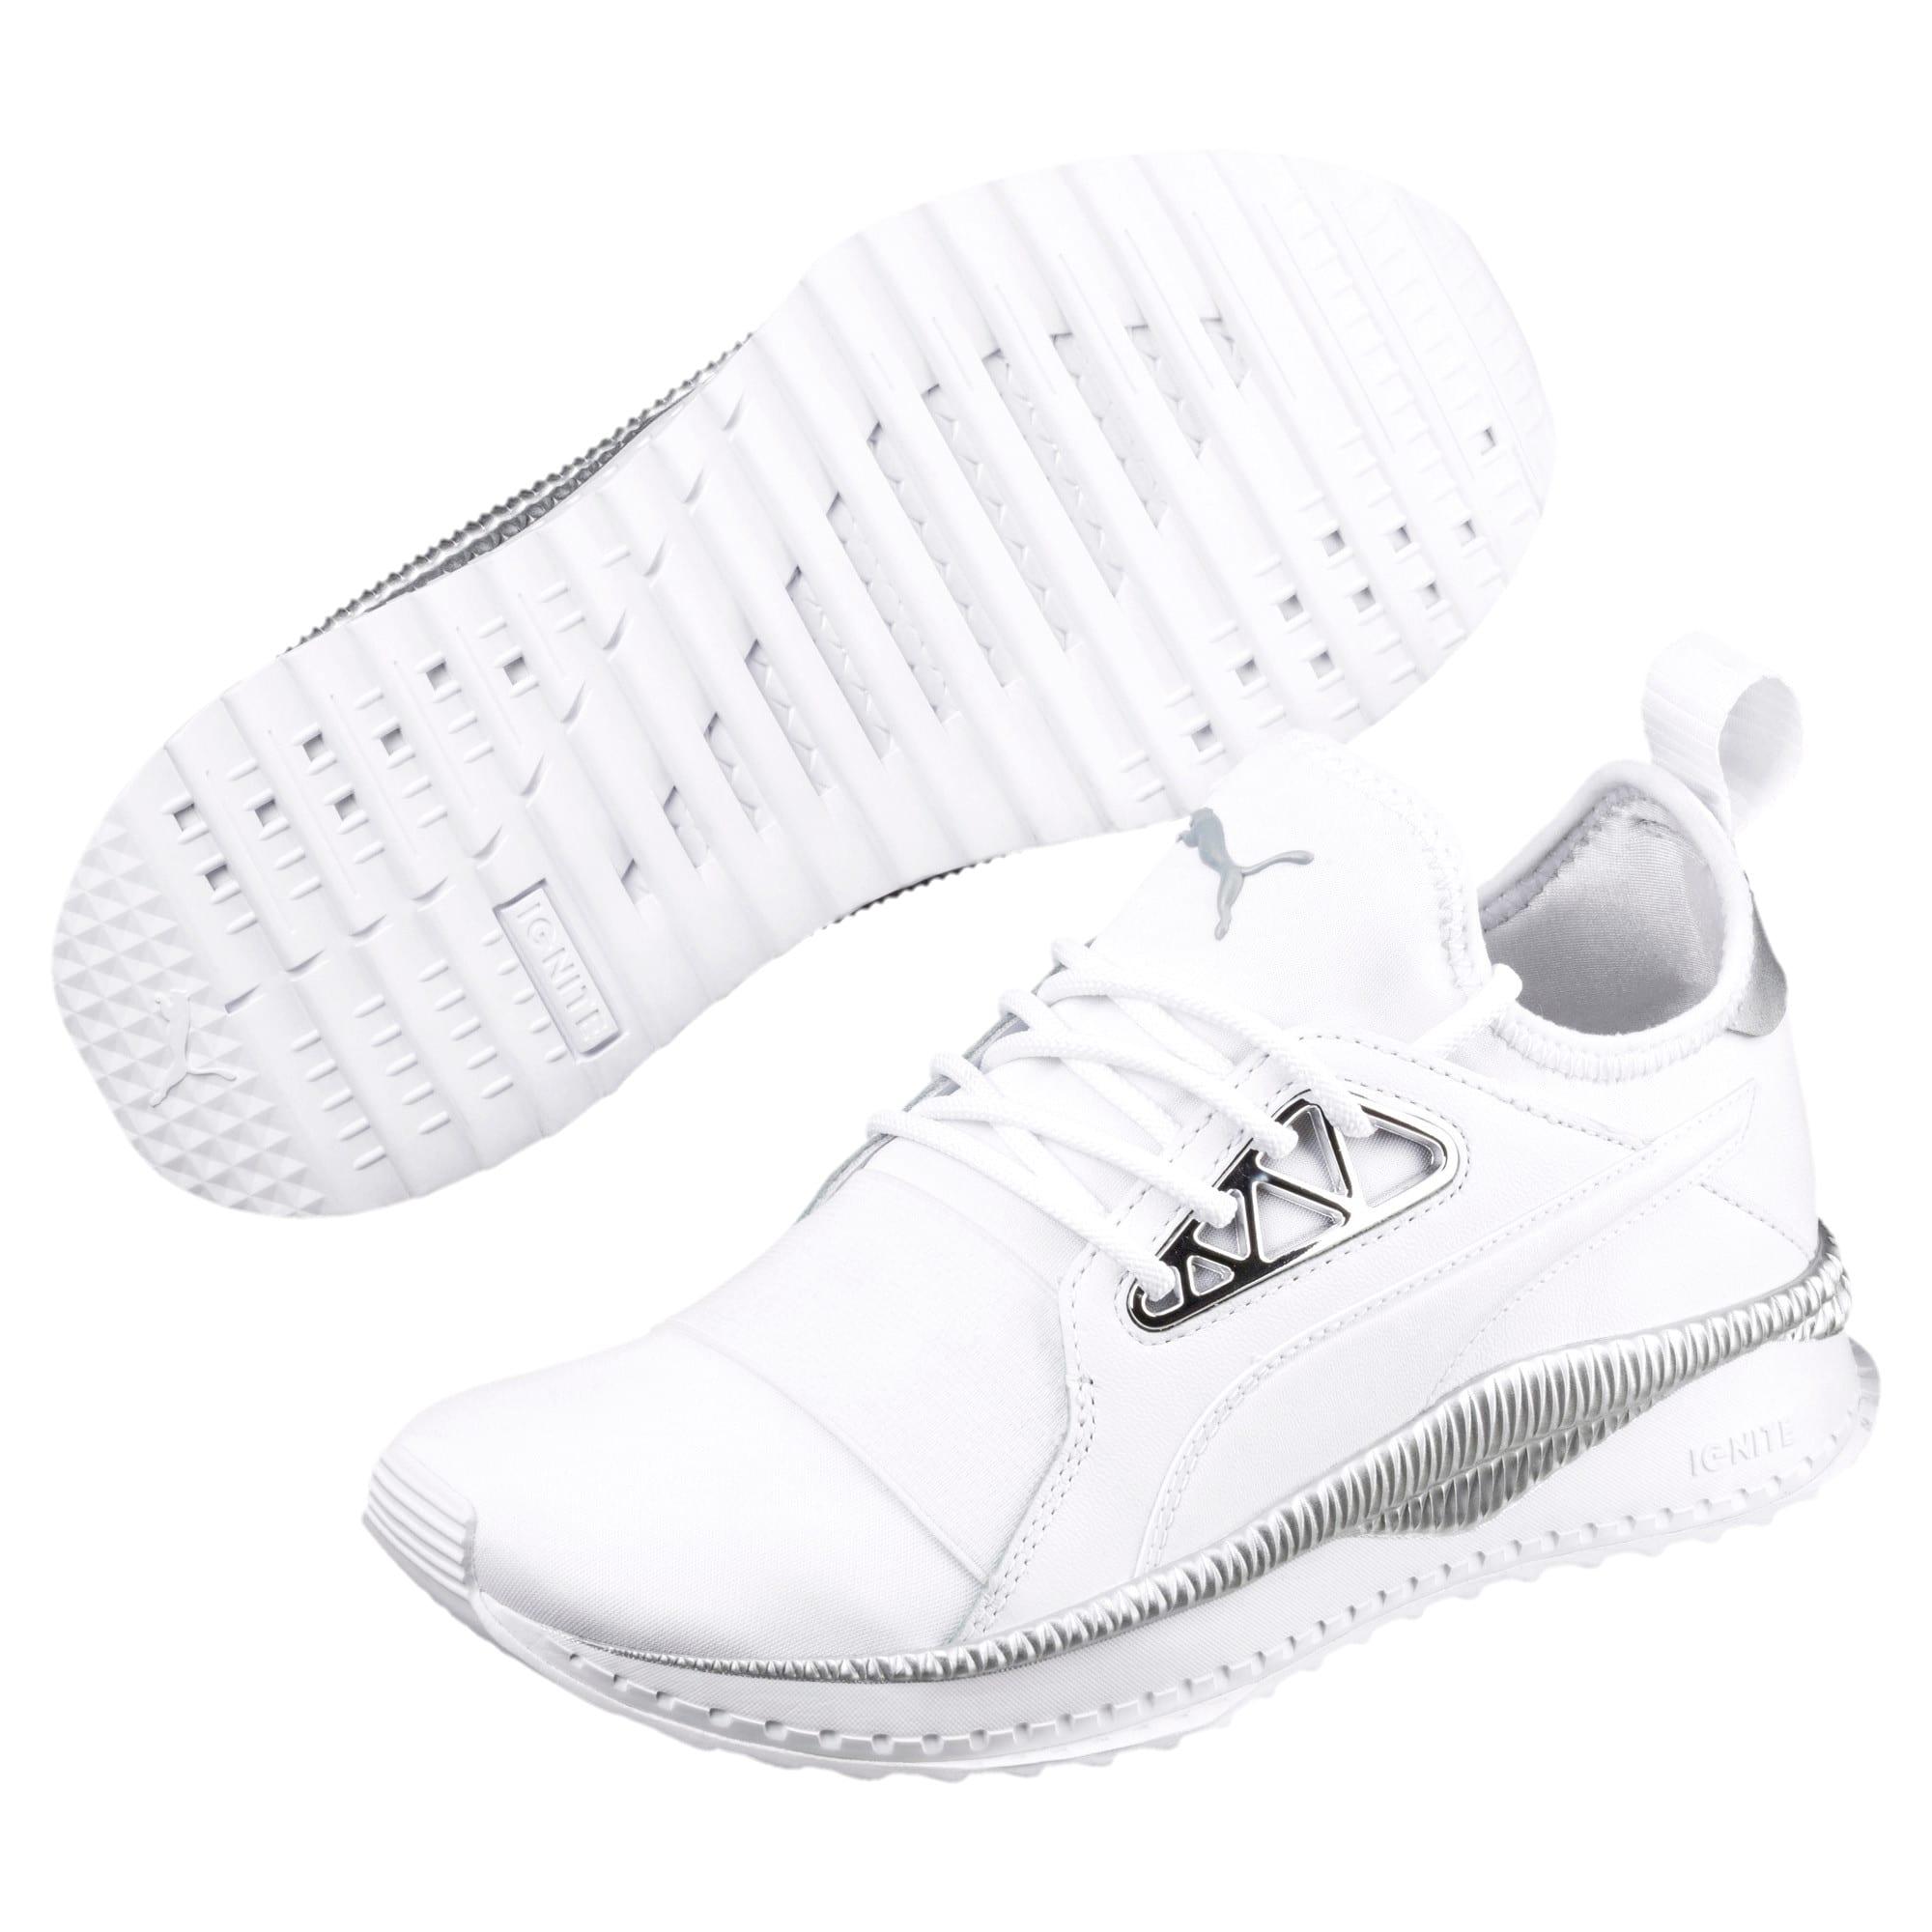 Thumbnail 2 of TSUGI Apex Jewel Women's Sneakers, Puma White-Puma White, medium